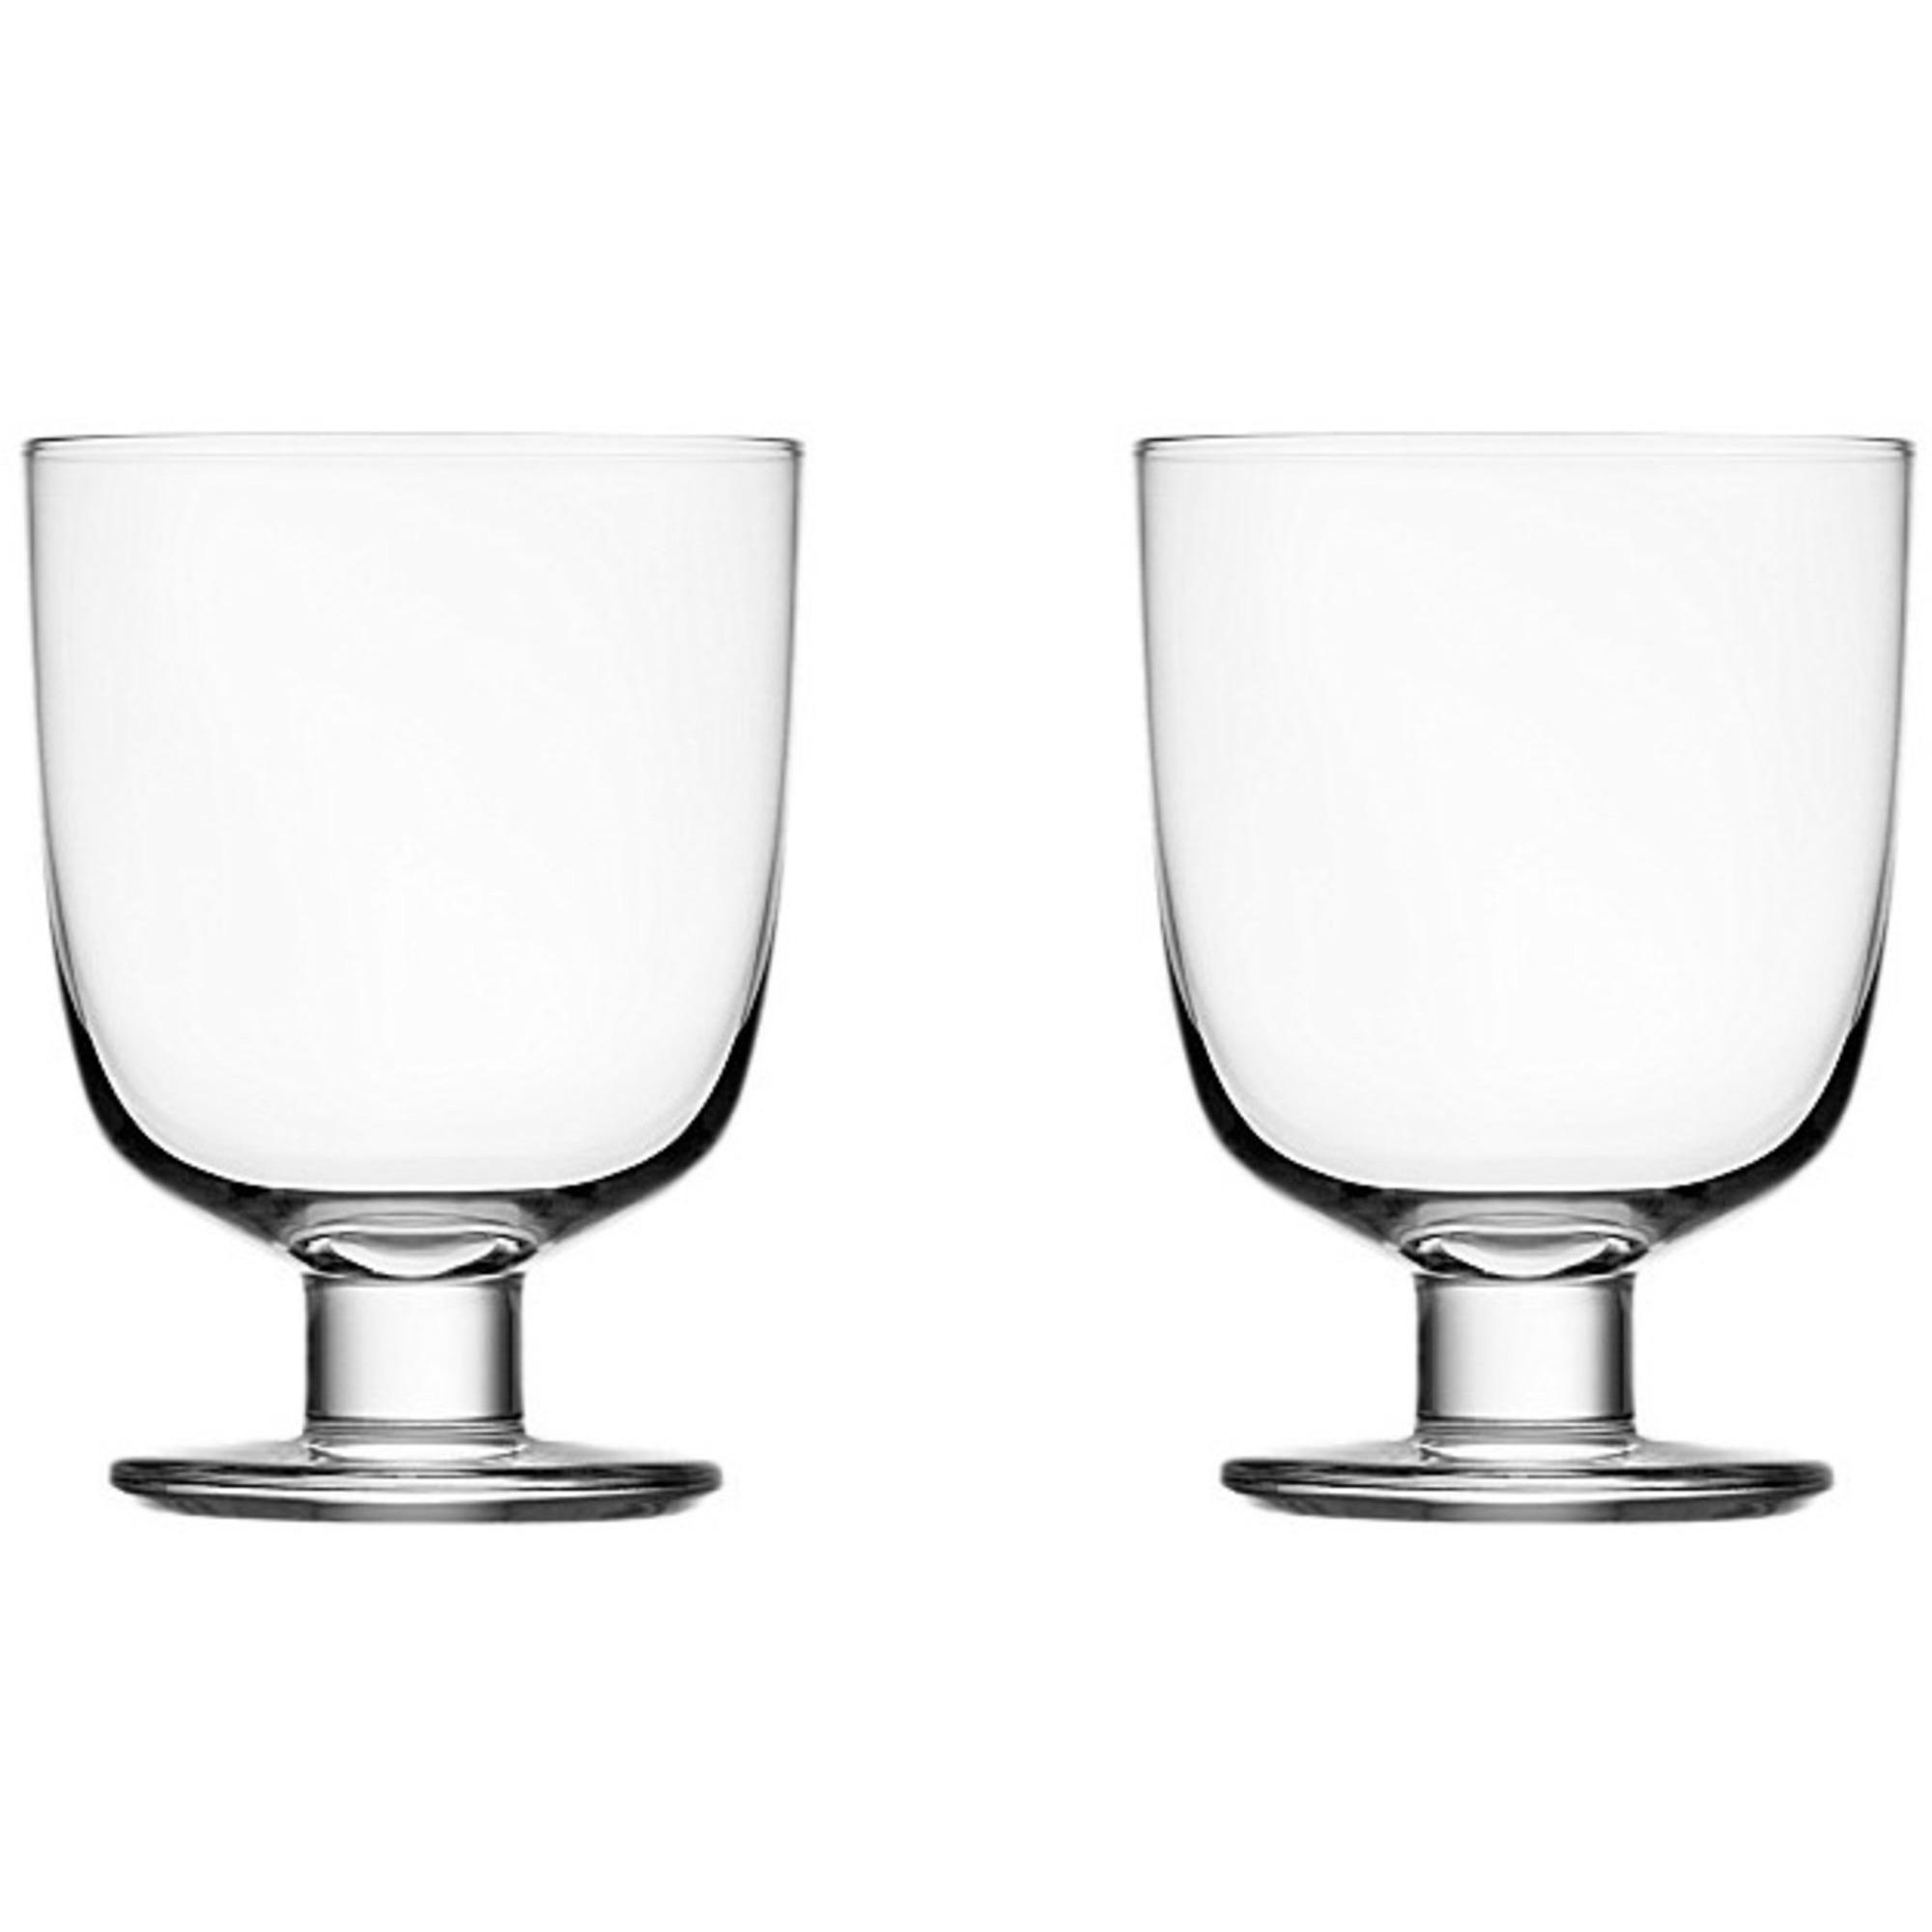 Iittala Lempi Glas 2-pack 34 cl